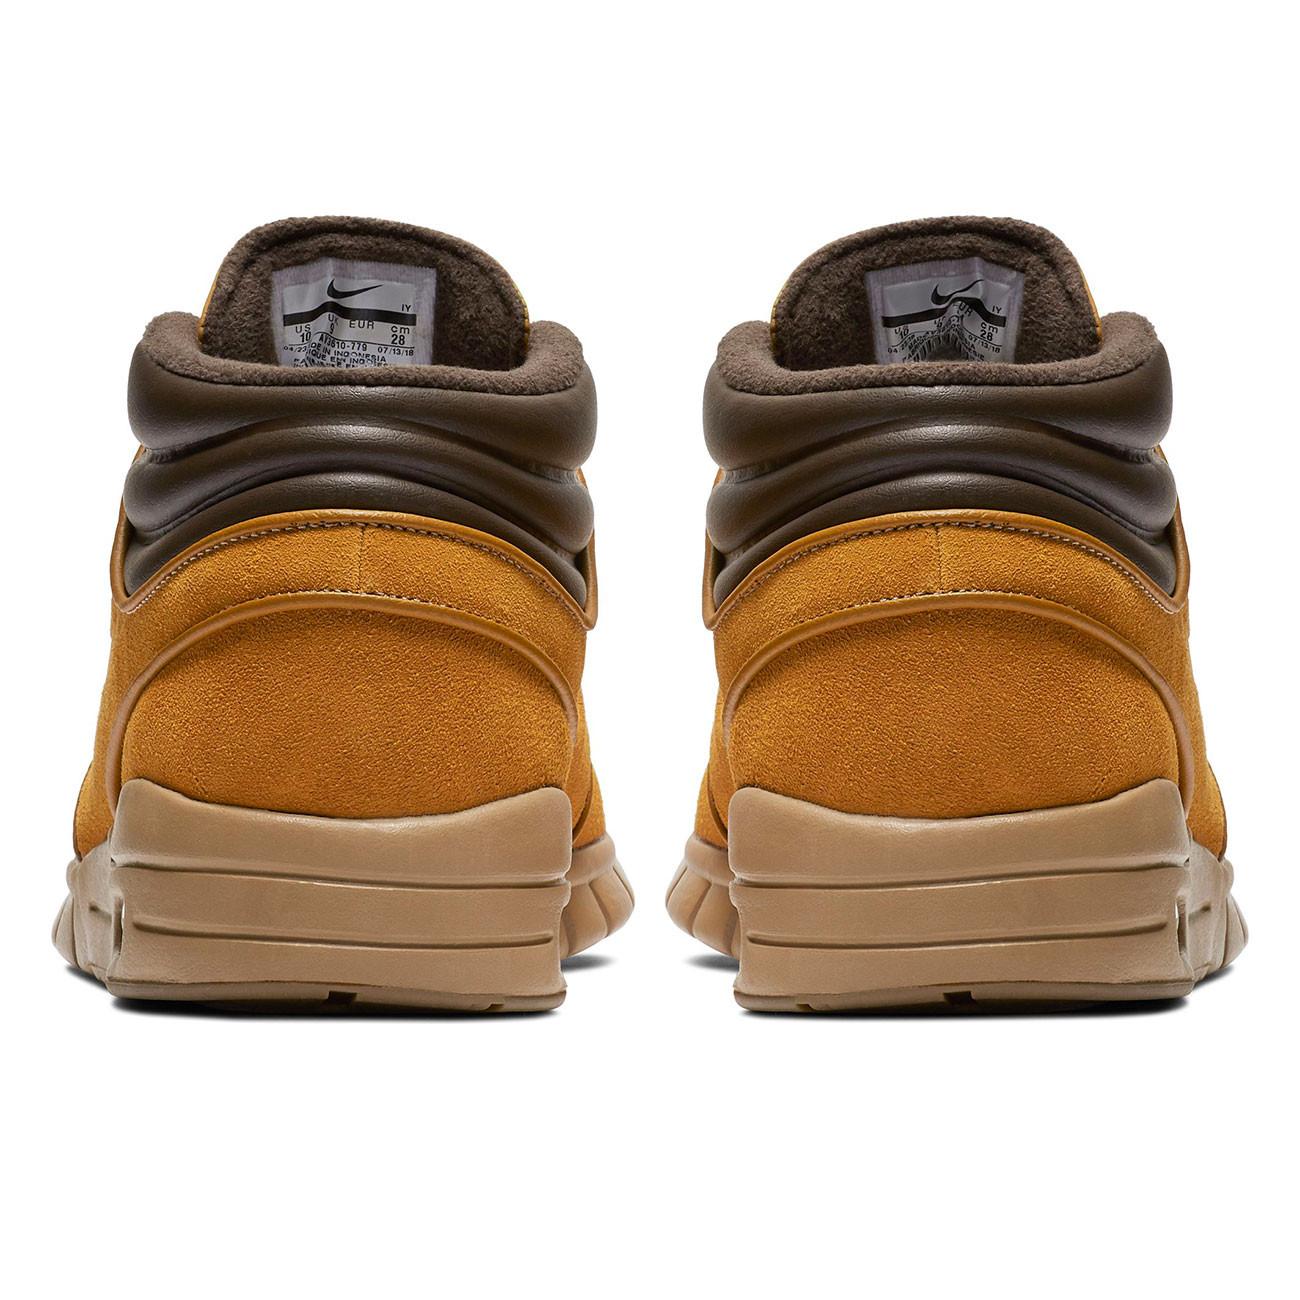 e8ecf0c0b27c4 Sneakers Nike SB Stefan Janoski Max Mid Premium bronze bronze-gum ...